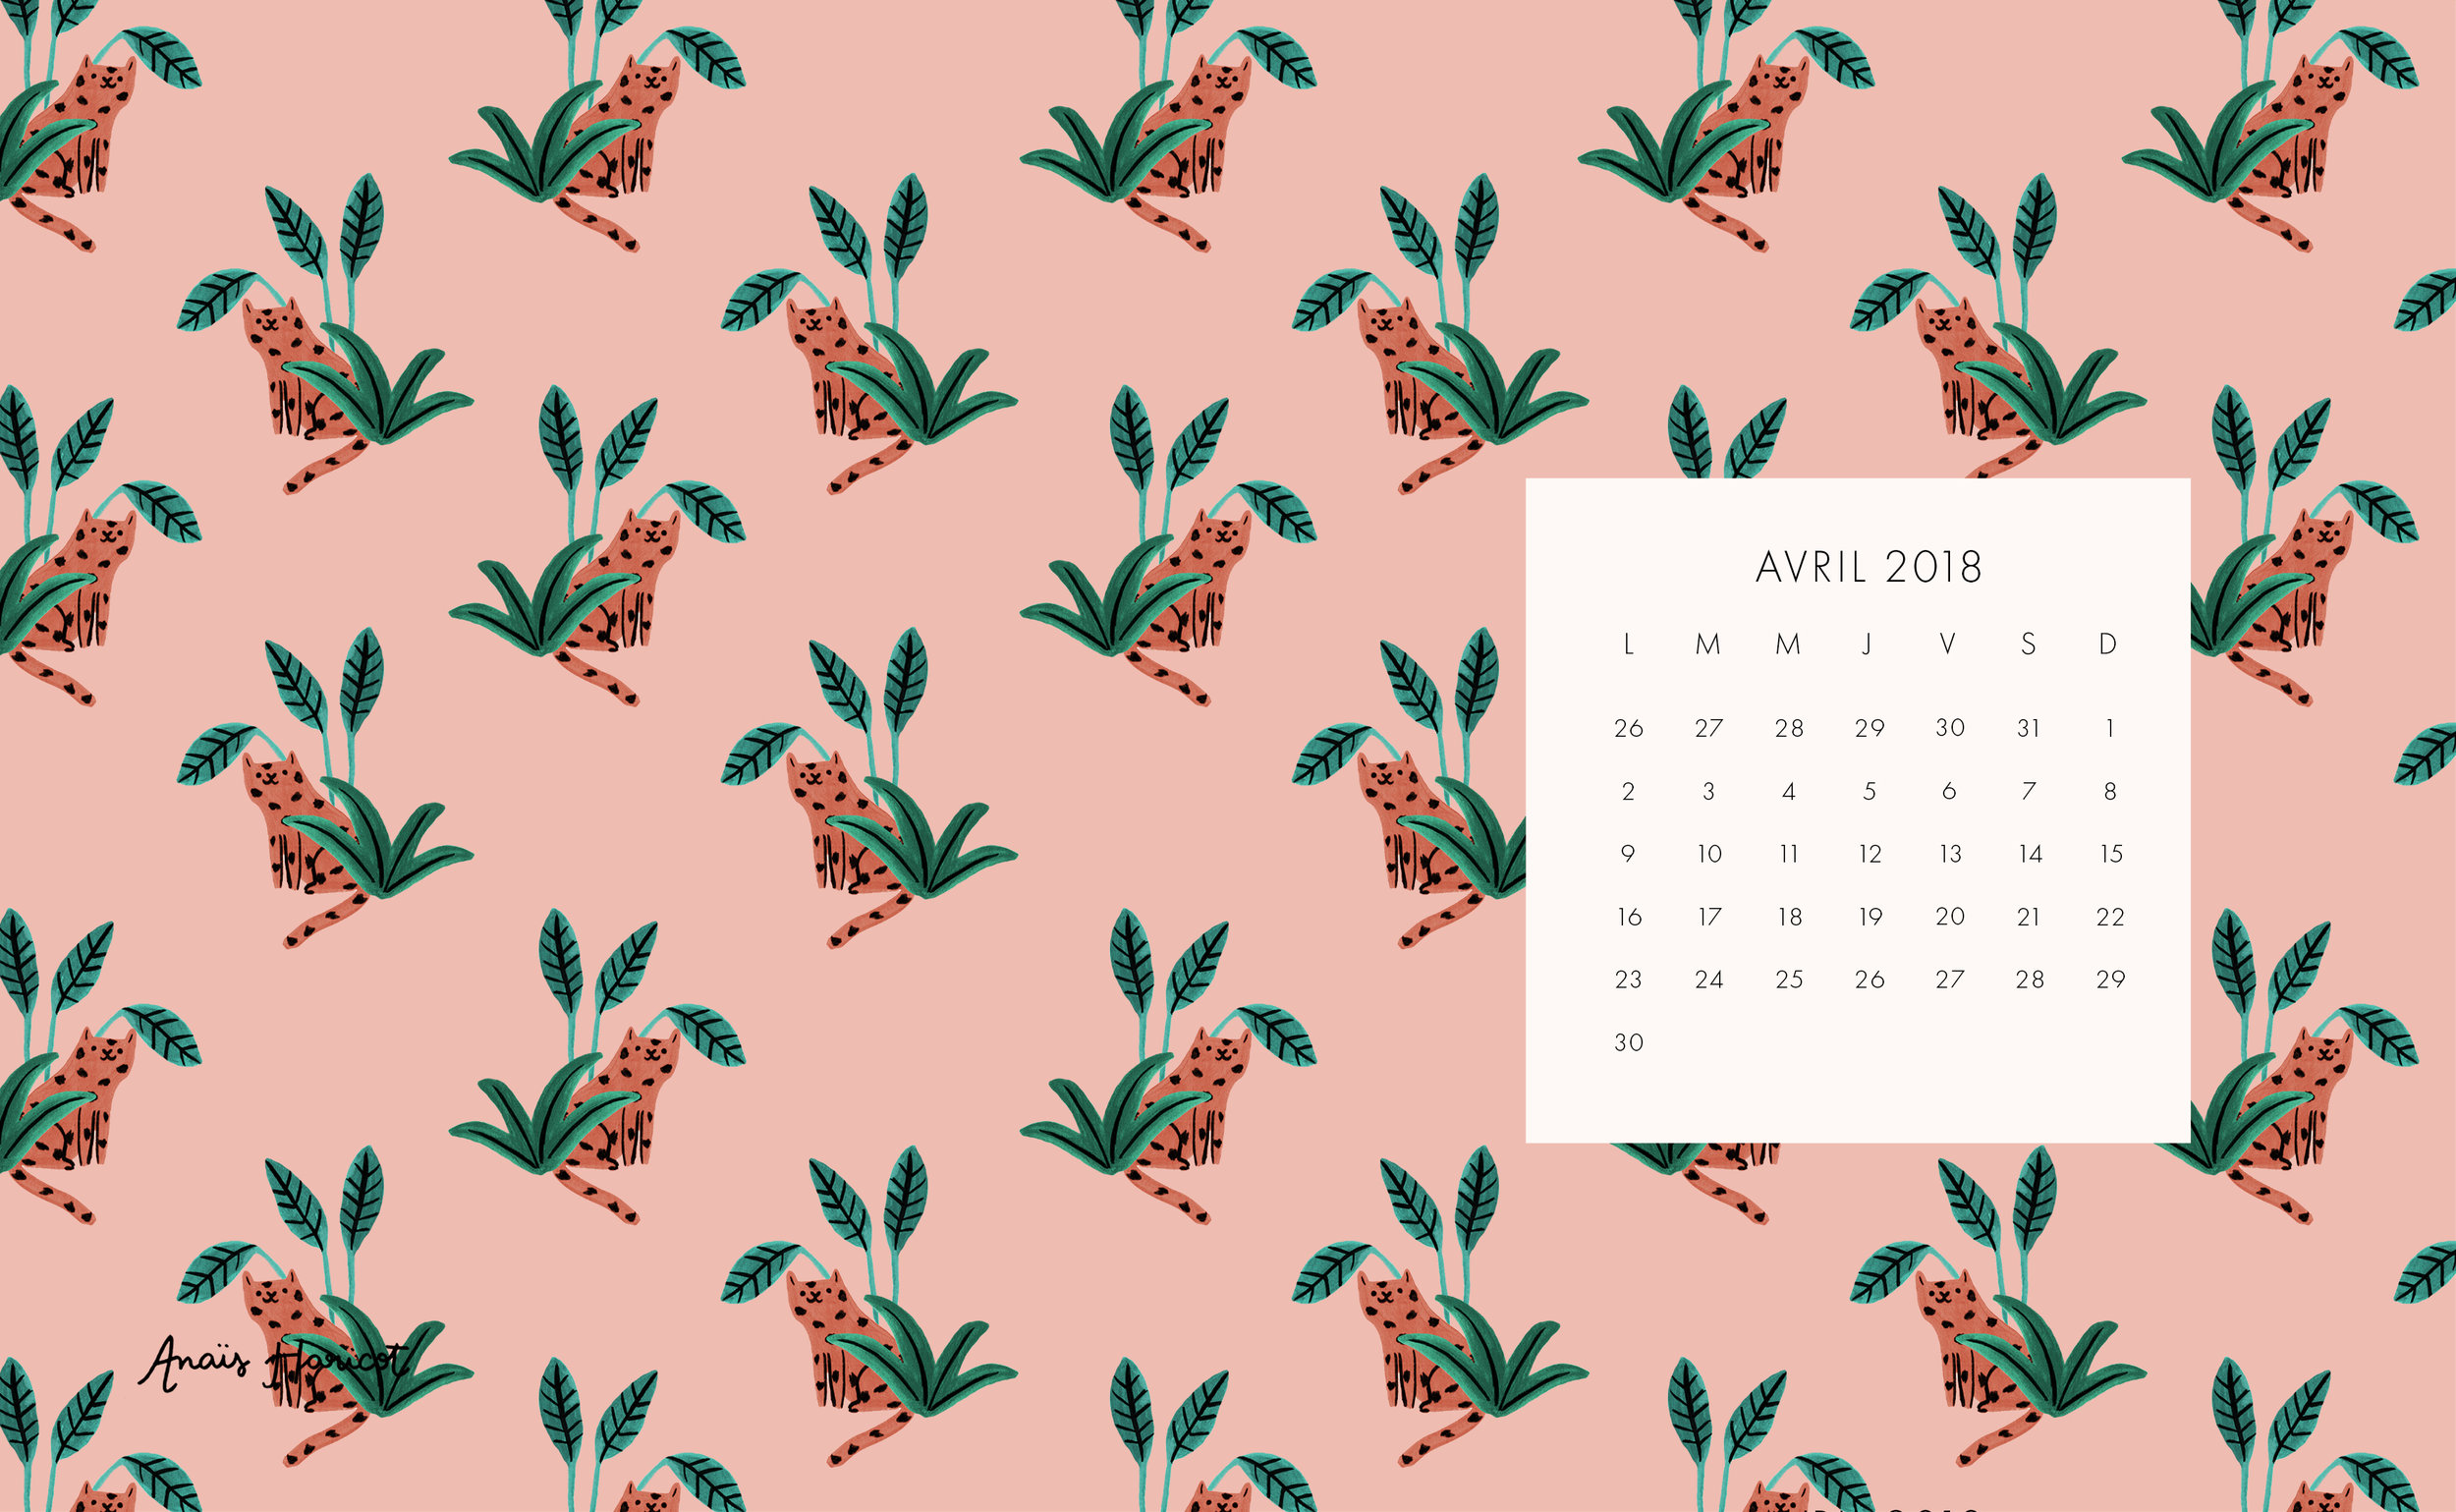 fondecran-ordi avril 2 .jpg